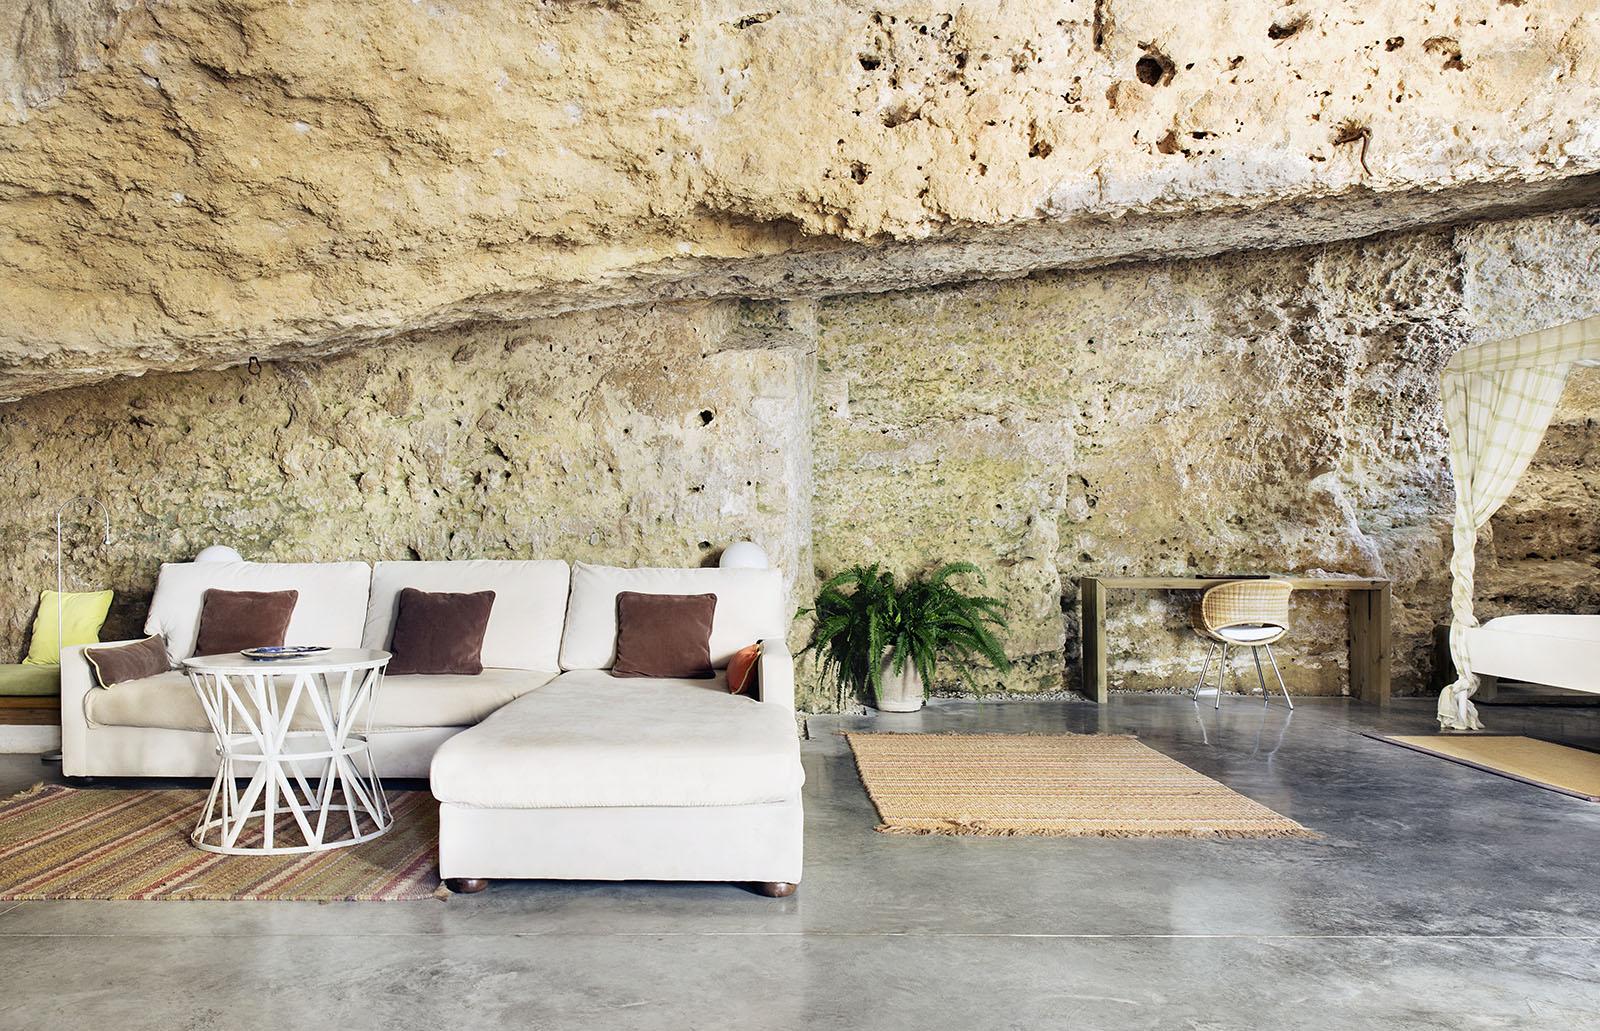 4. Cave House in Villarrubia Córdoba - Casa Tierra: a Cave House in Córdoba by UMMO Estudio